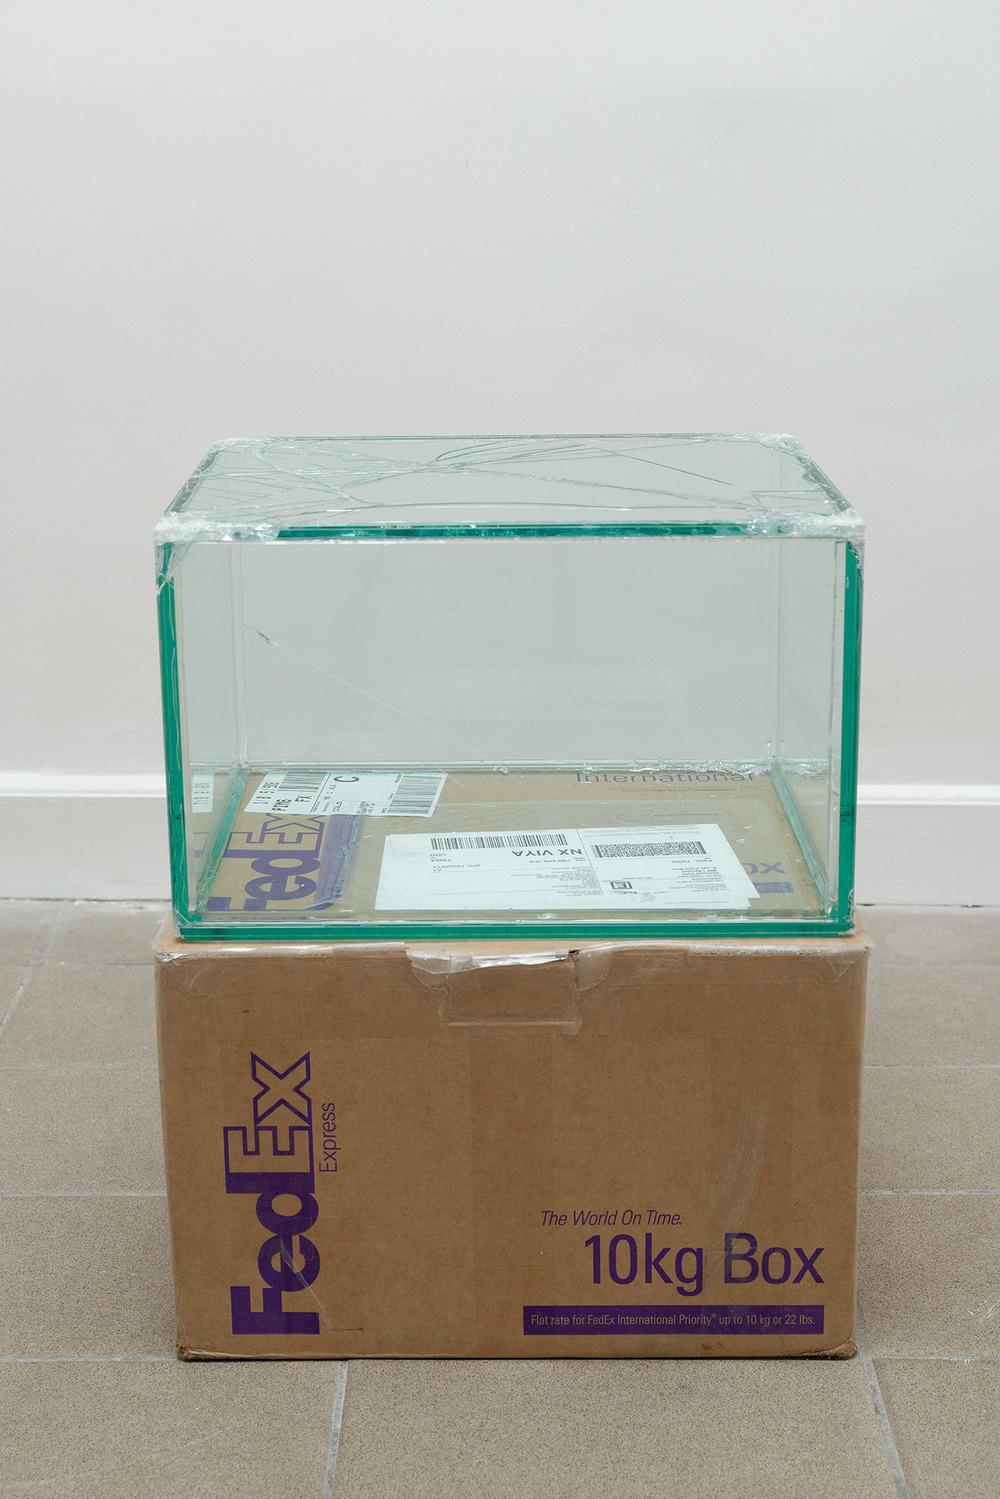 FedEx® 10kg Box  © 2006 FedEx 149801 REV 9/06 MP, International Priority, Los Angeles-Paris trk#796906988159, October 14-16, 2013    2013–   Laminated glass, FedEx shipping box, accrued FedEx shipping and tracking labels, silicone, metal, tape  10 1/2 x 16 1/4 x 13 1/4 inches   8 rue Saint-Bon, 2013